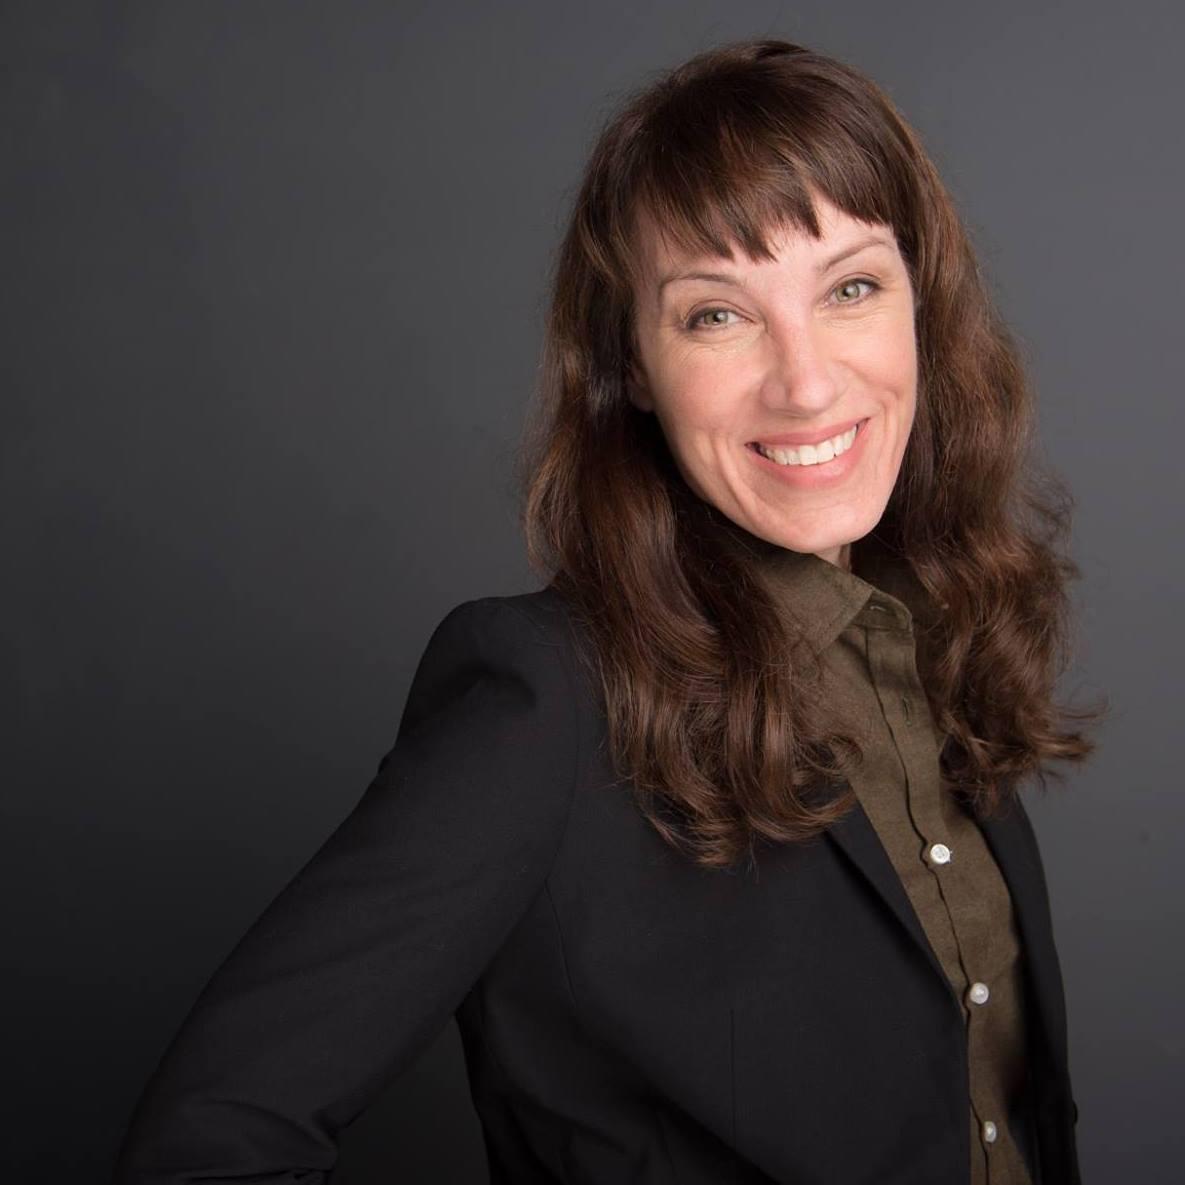 Jennifer Van Evra, photo credit Wendy D Photography